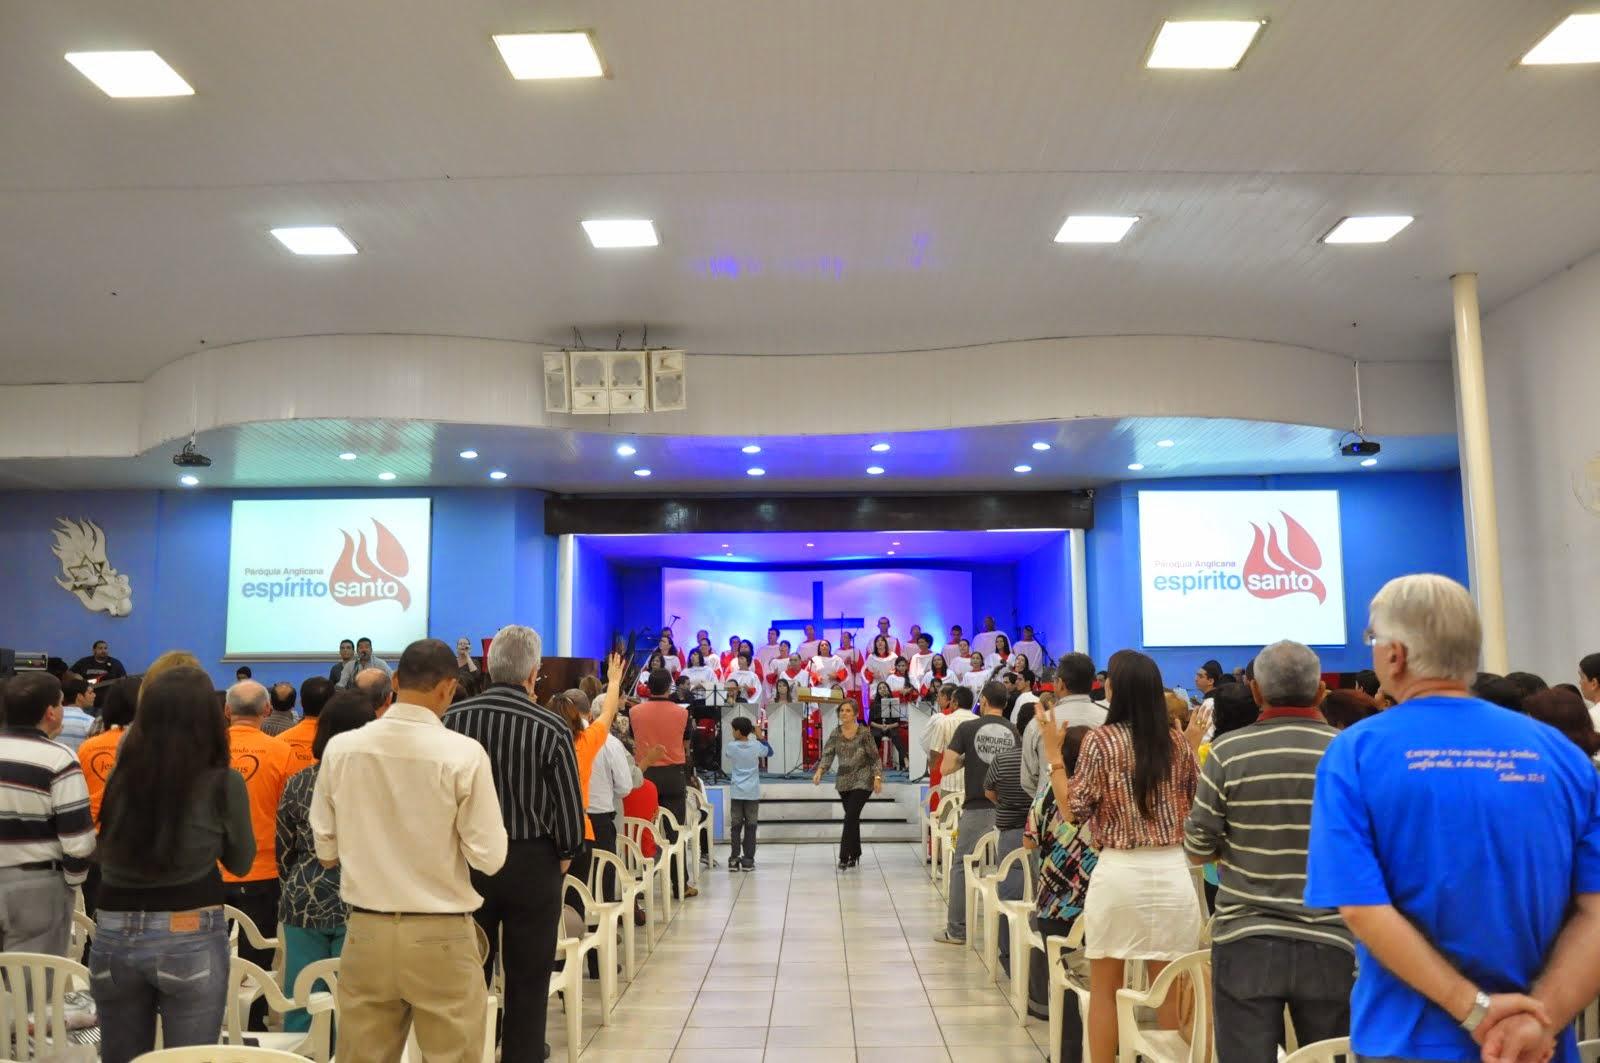 Culto da PAES ao vivo, PAES Services alive